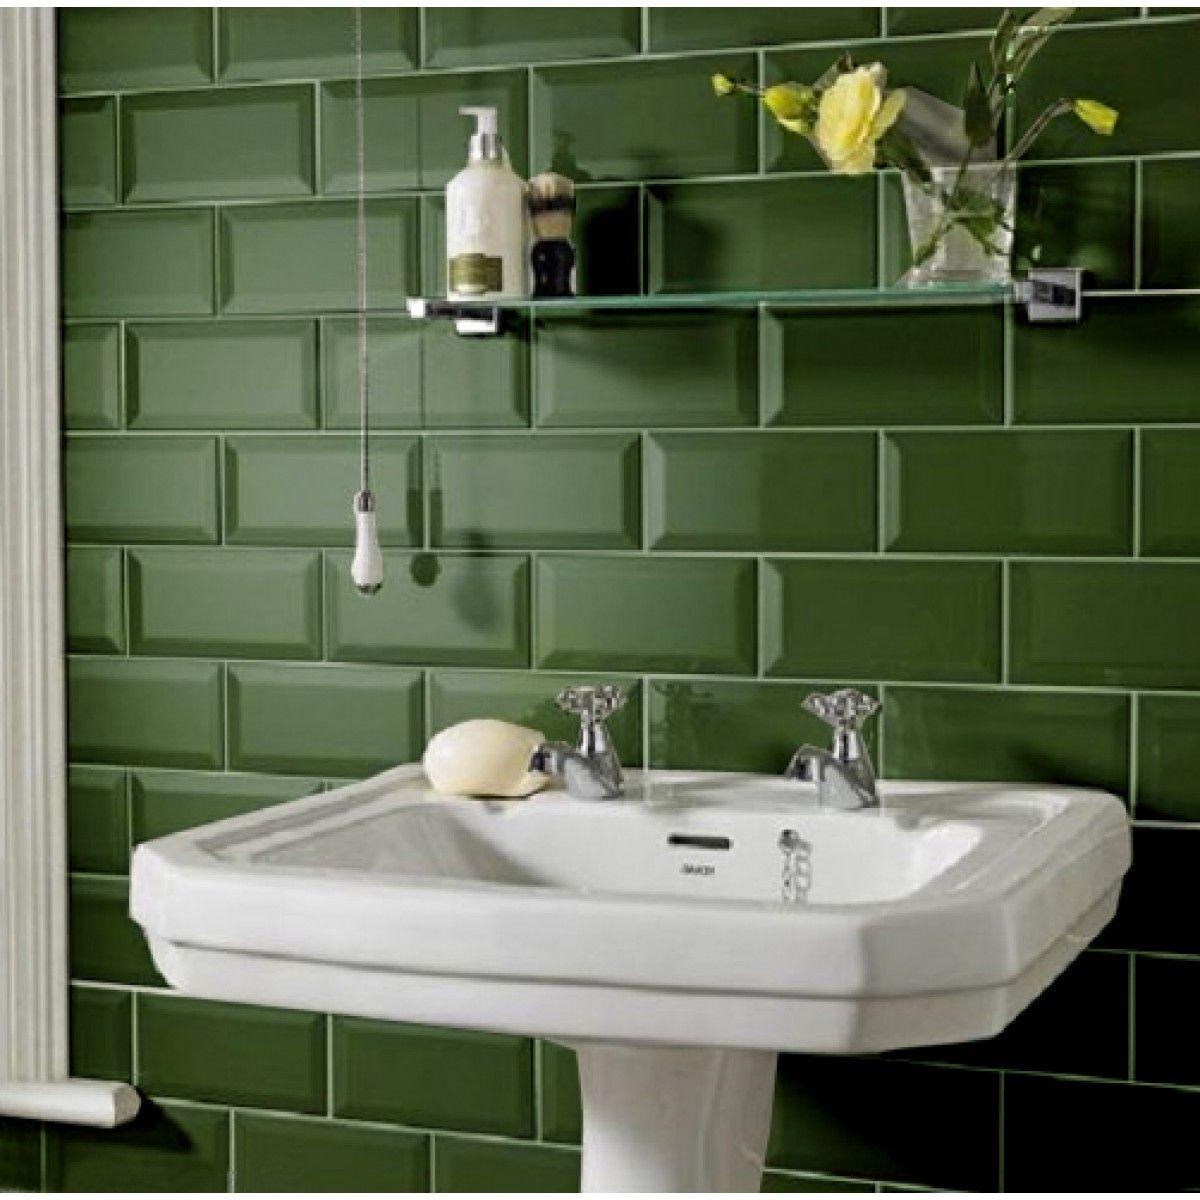 Metro dark green 200mm x 100mm bathroom tiles pinterest metro dark green 200mm x 100mm dailygadgetfo Image collections